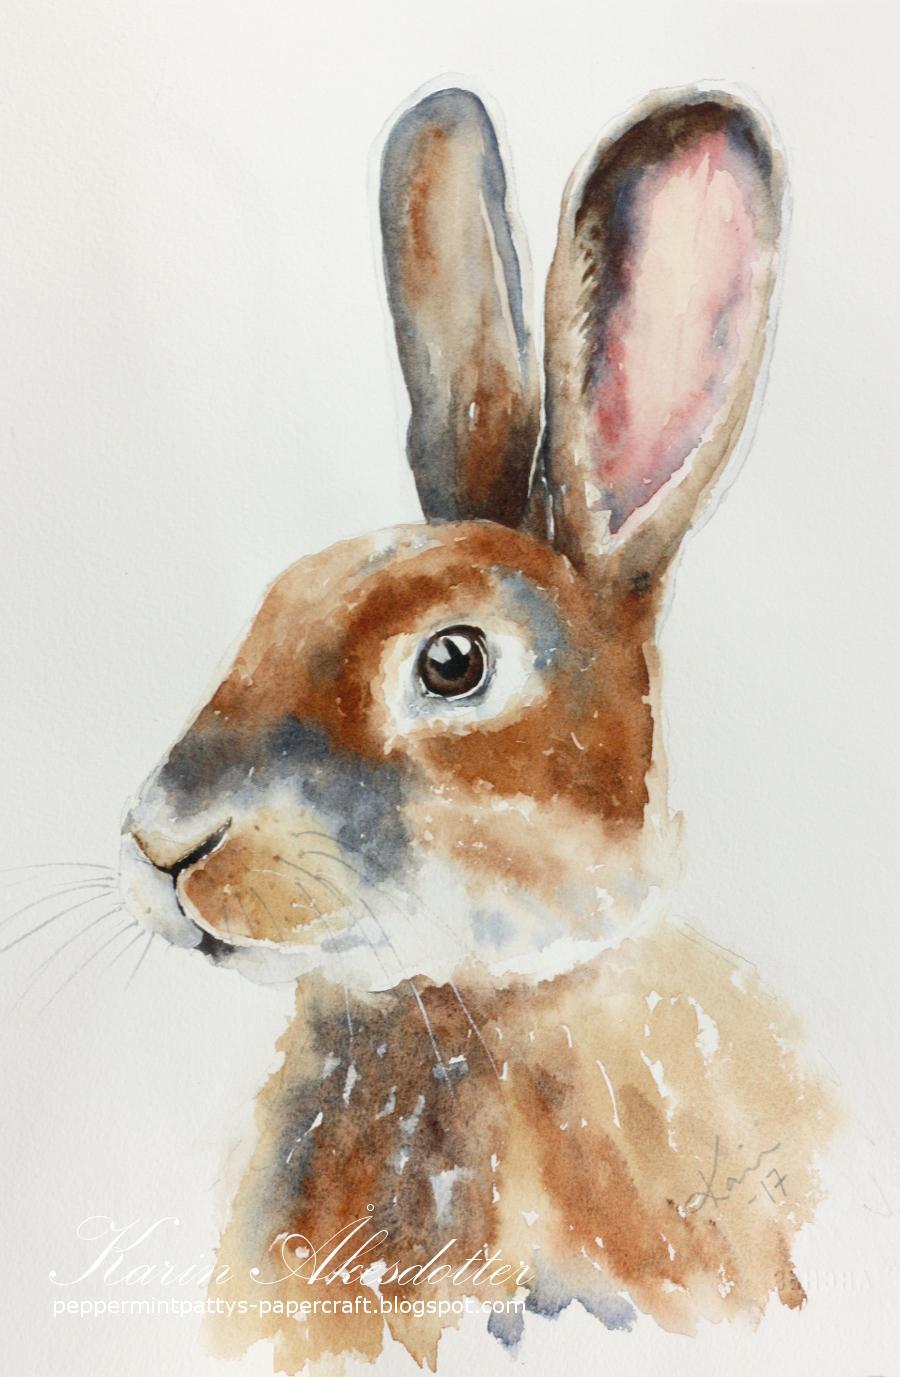 Peppermint Patty S Papercraft Sunday Watercolors Rabbits